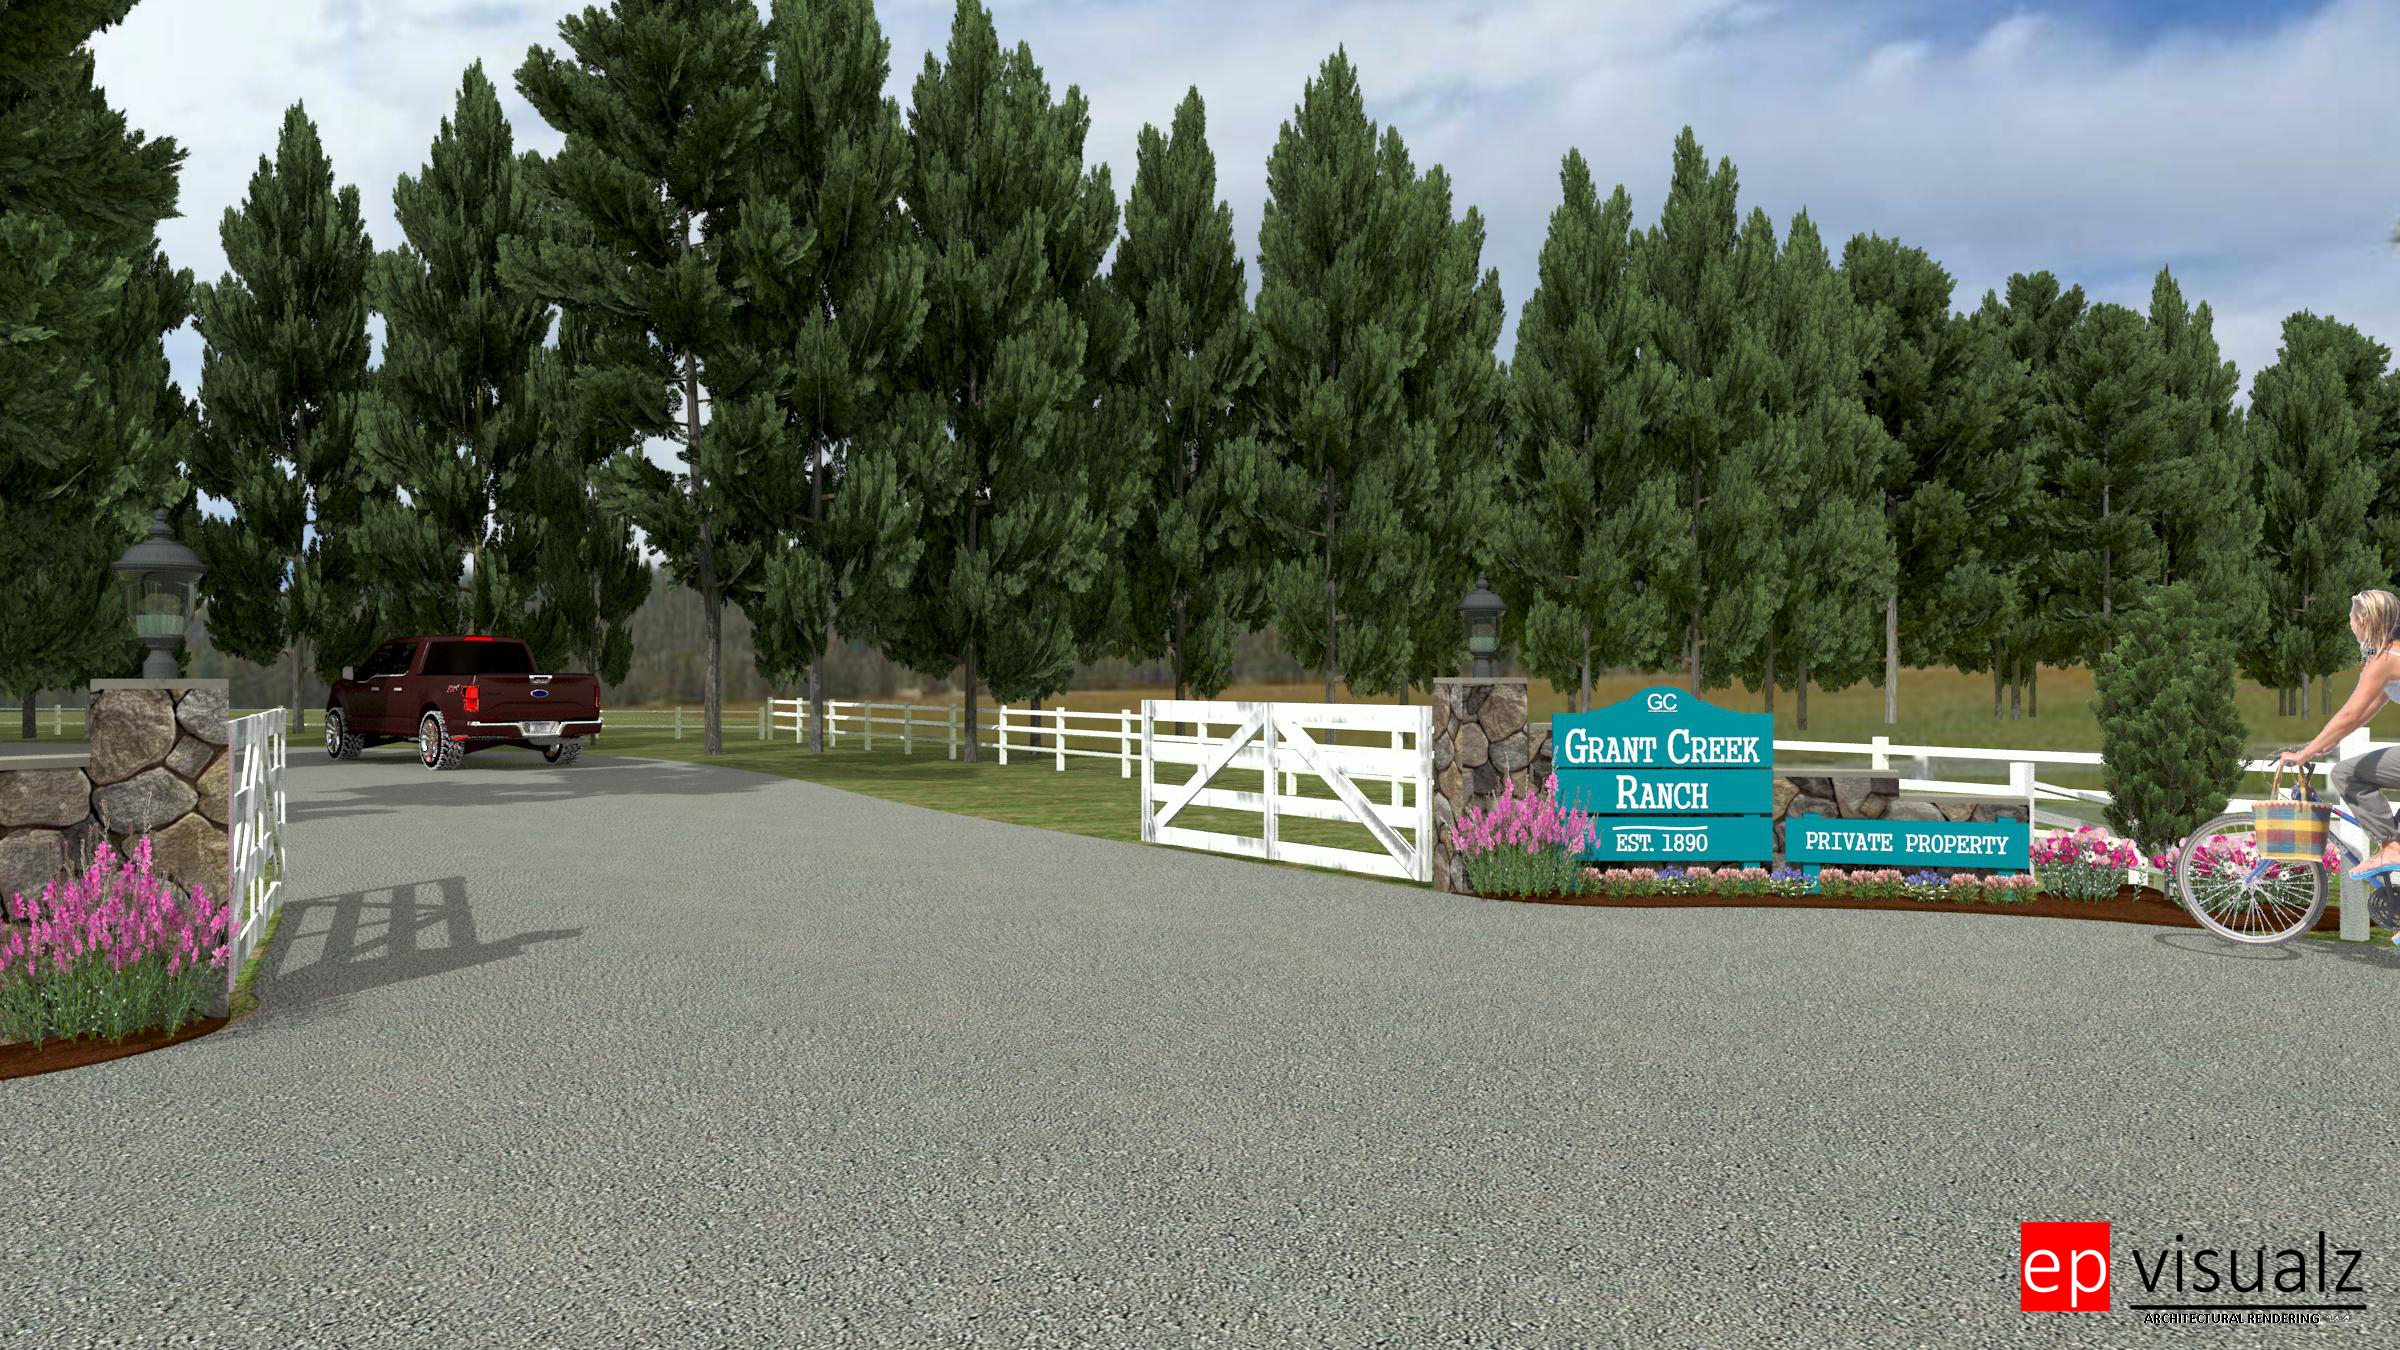 Grant Creek ranch Entry-close